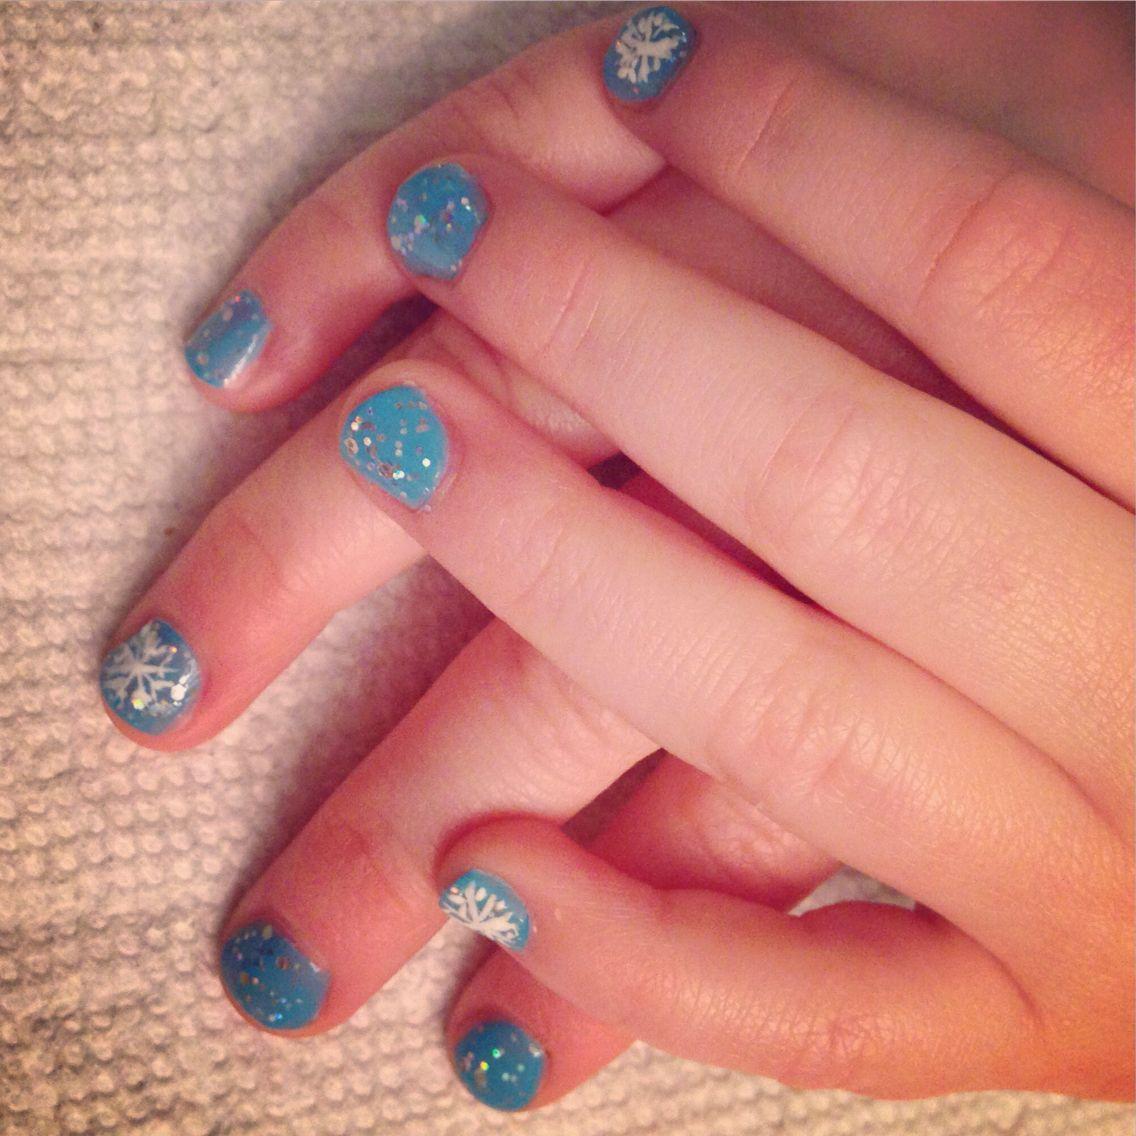 Frozen nail design for little girl | nails | Pinterest | Frozen nail ...